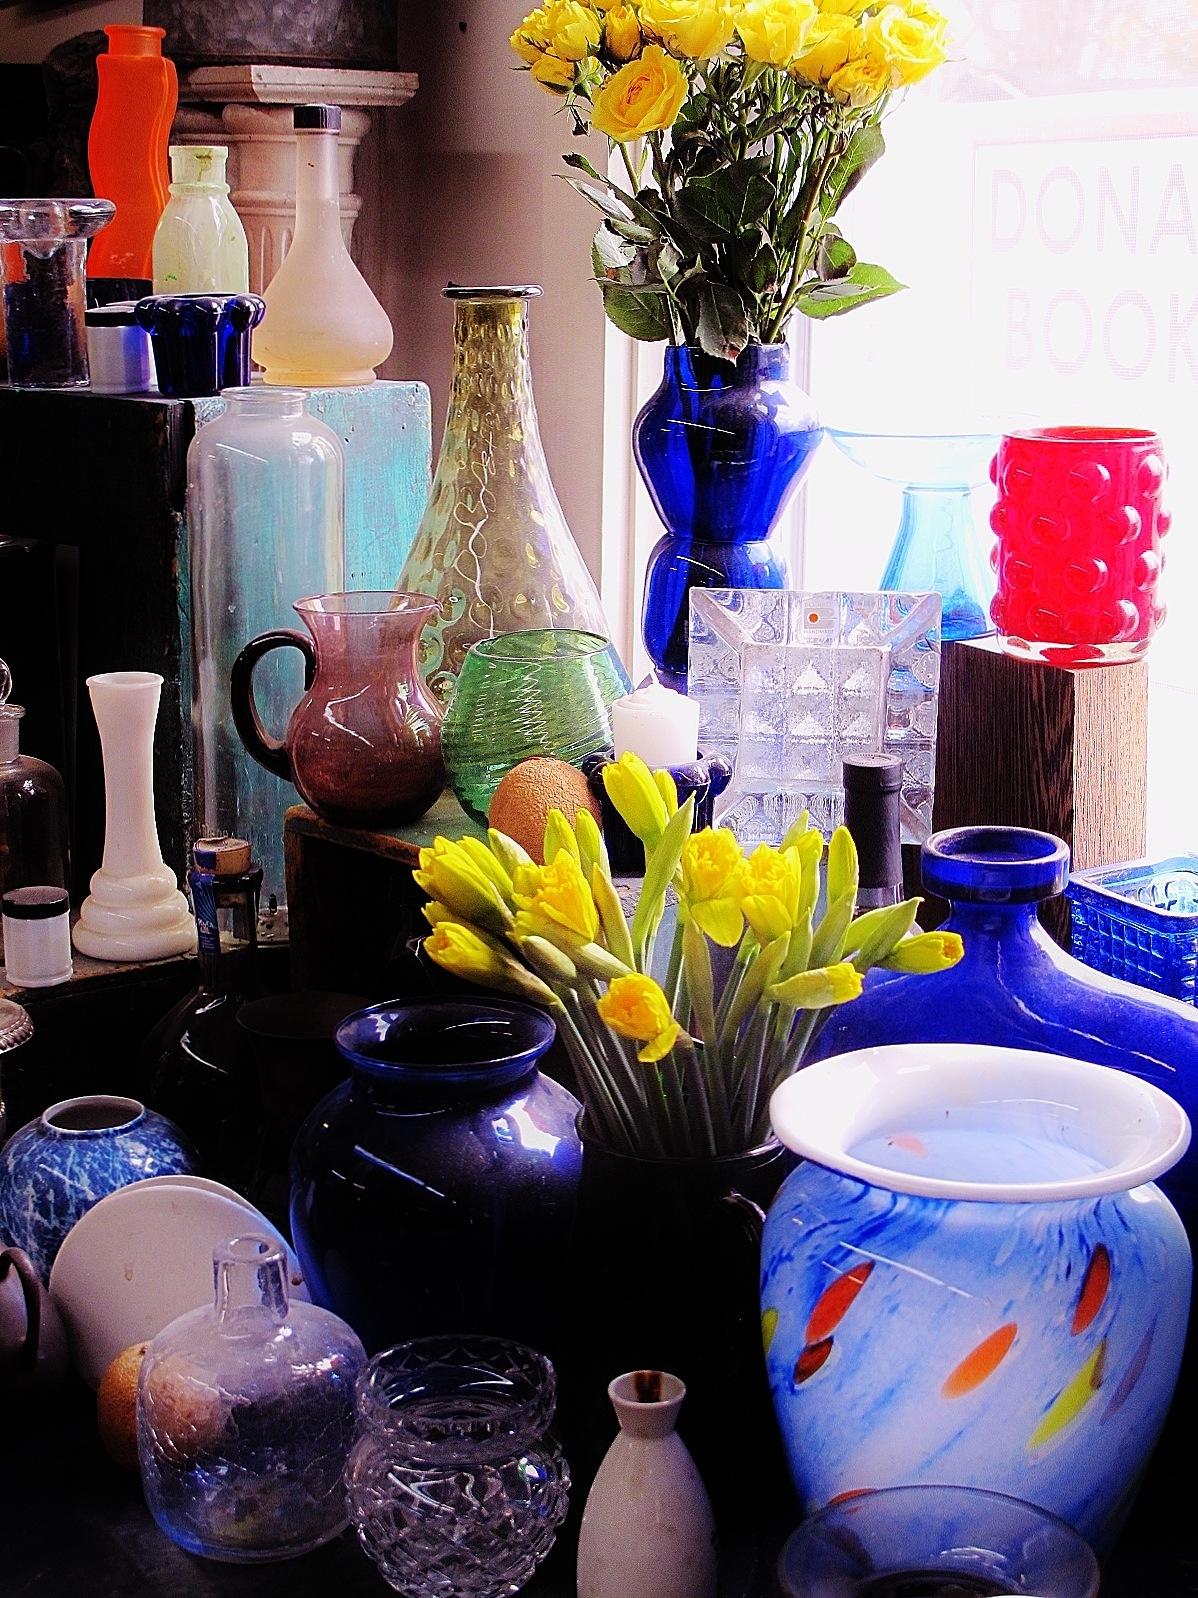 studio still life  by paulcrimi178